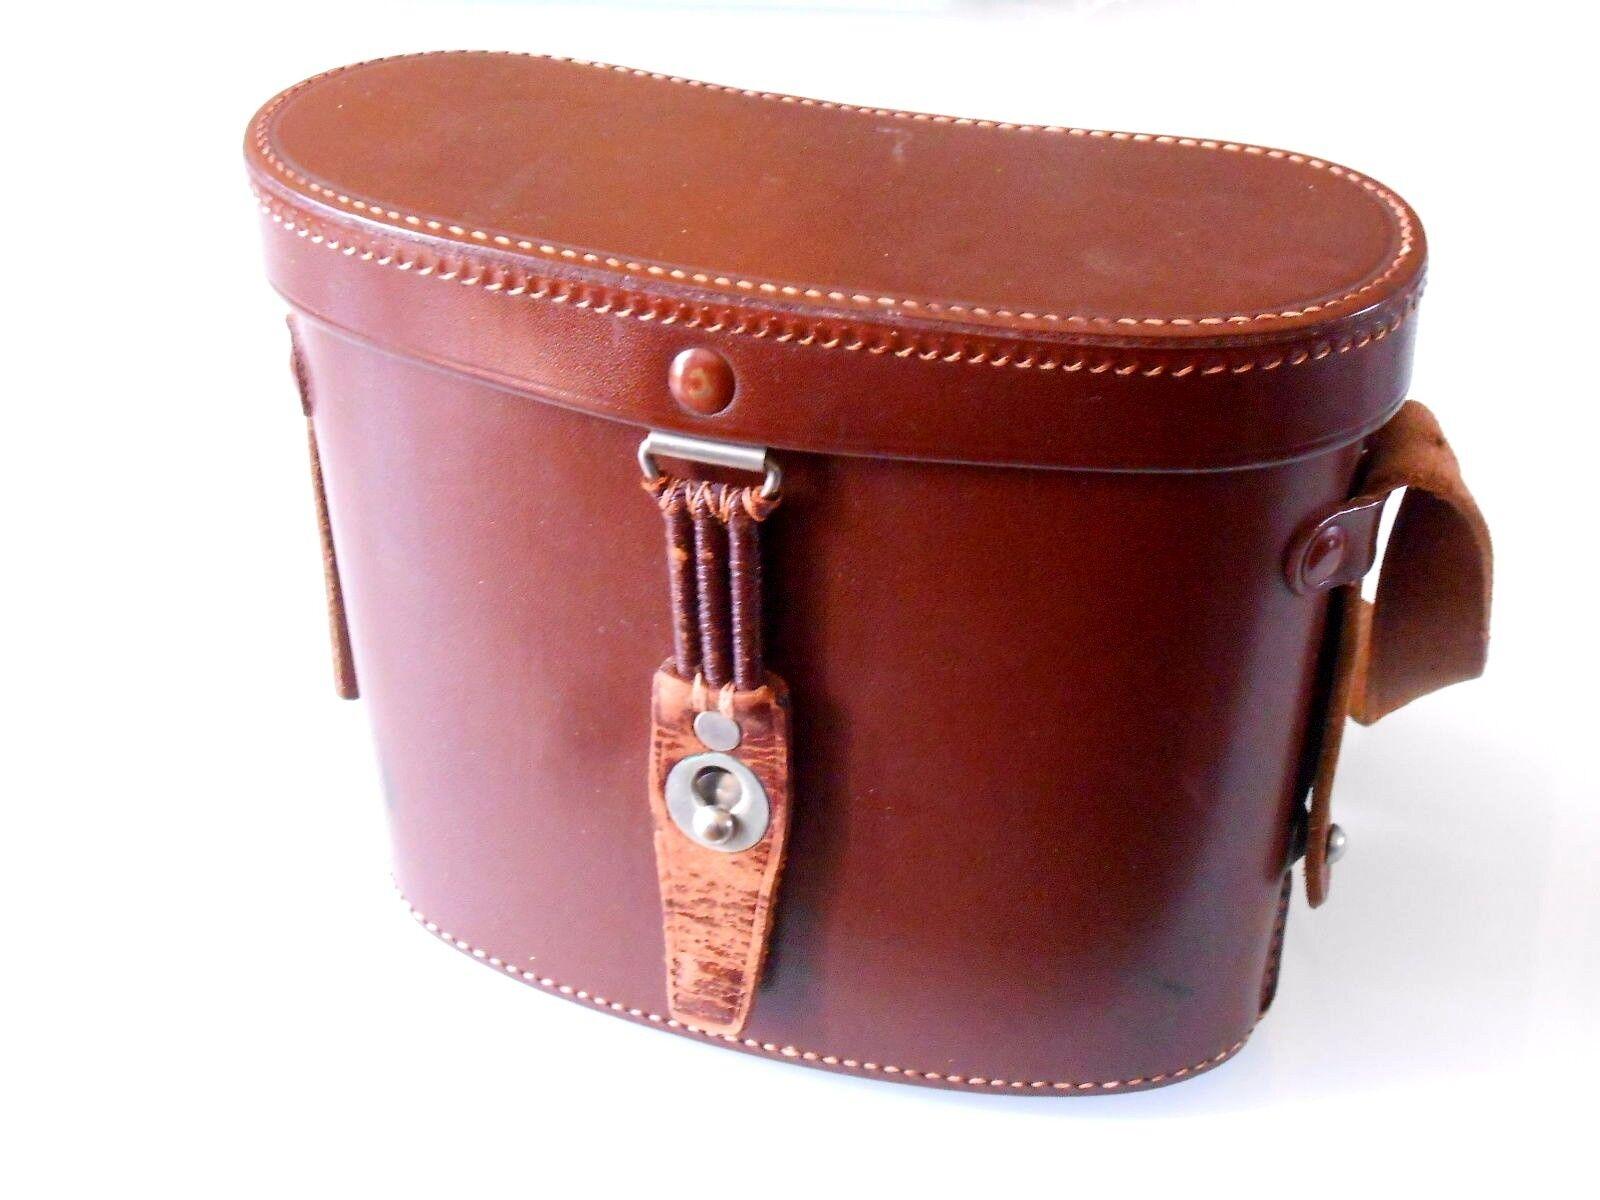 Carl Zeiss Jena prismáticos bolso para 8x30, marrón top